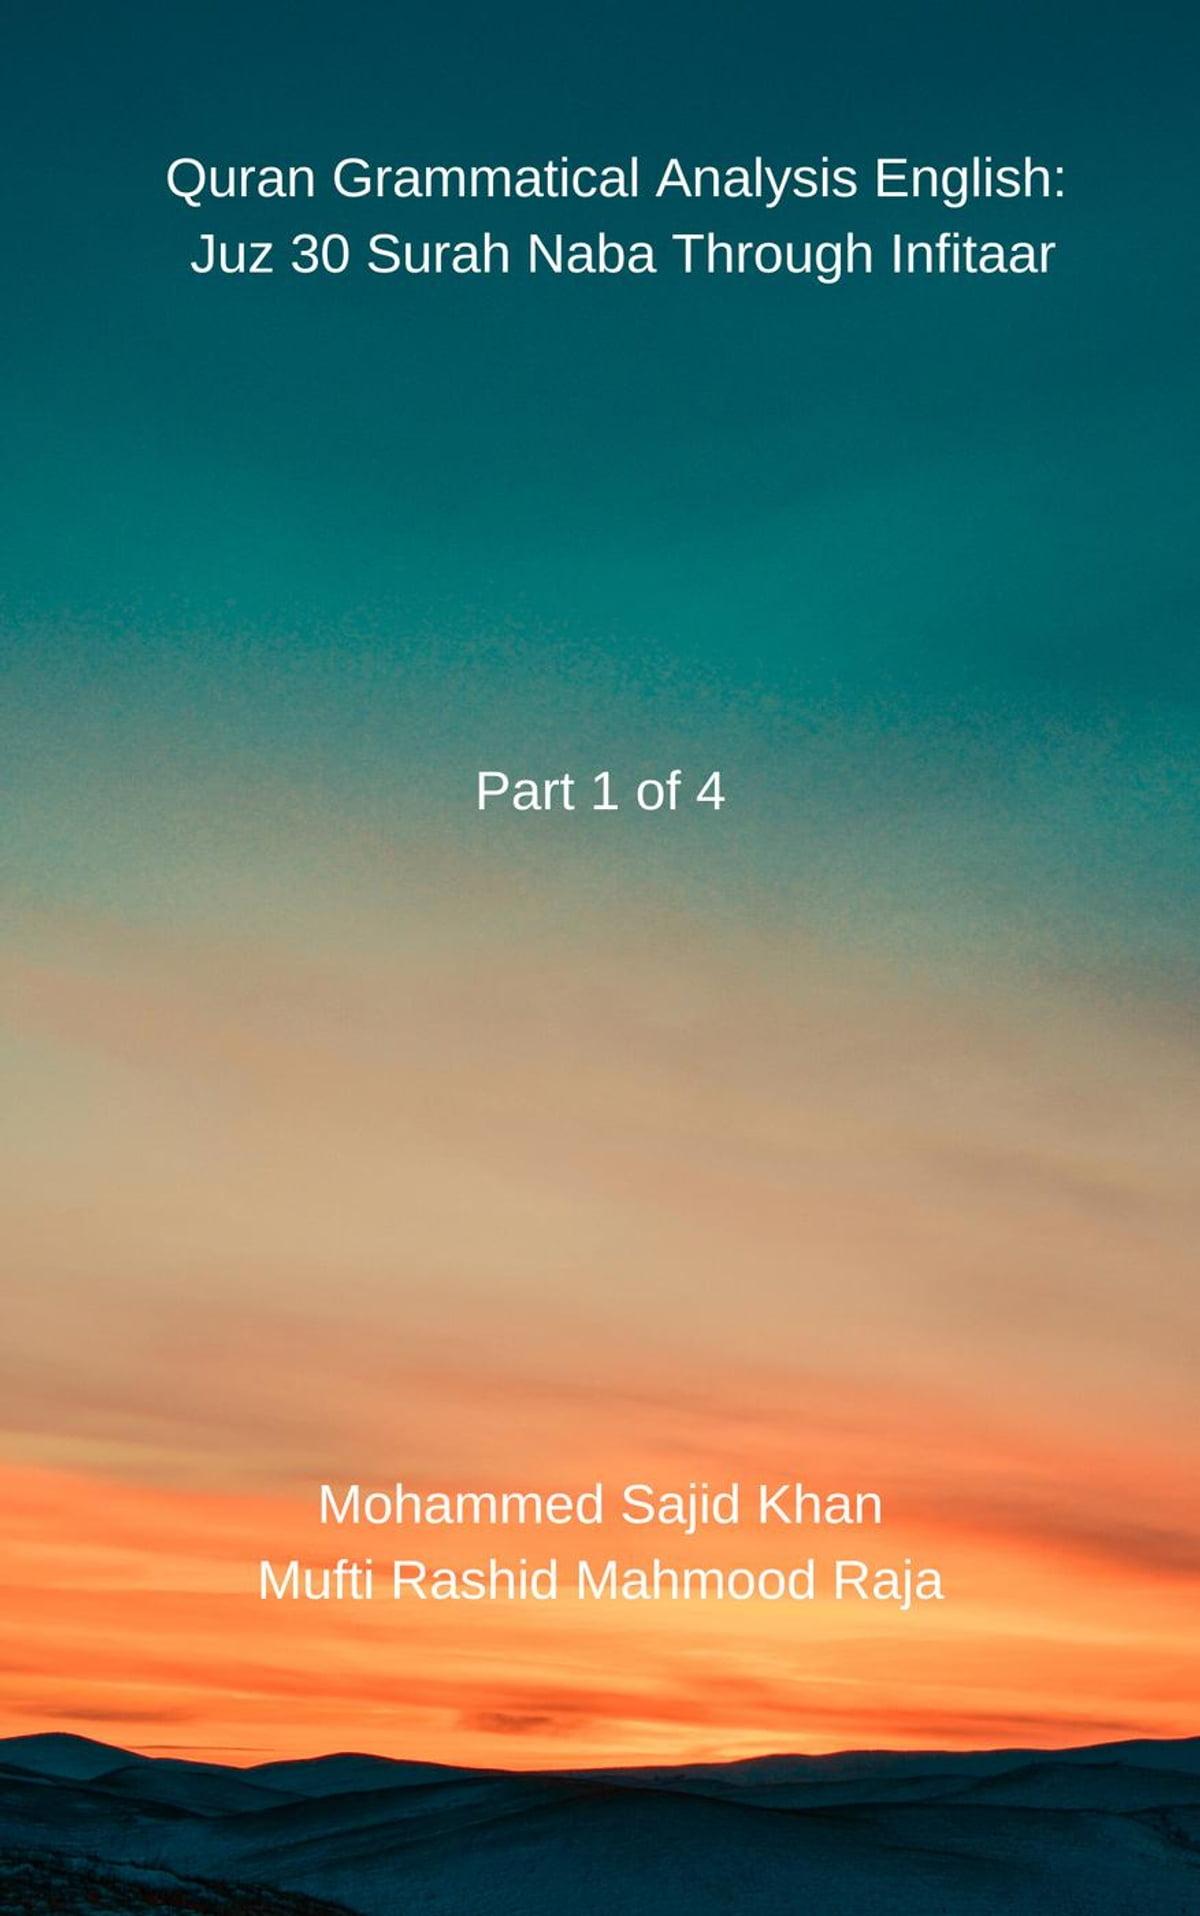 Grammaticalysis English Quran Juz 30 Para Amma Surah